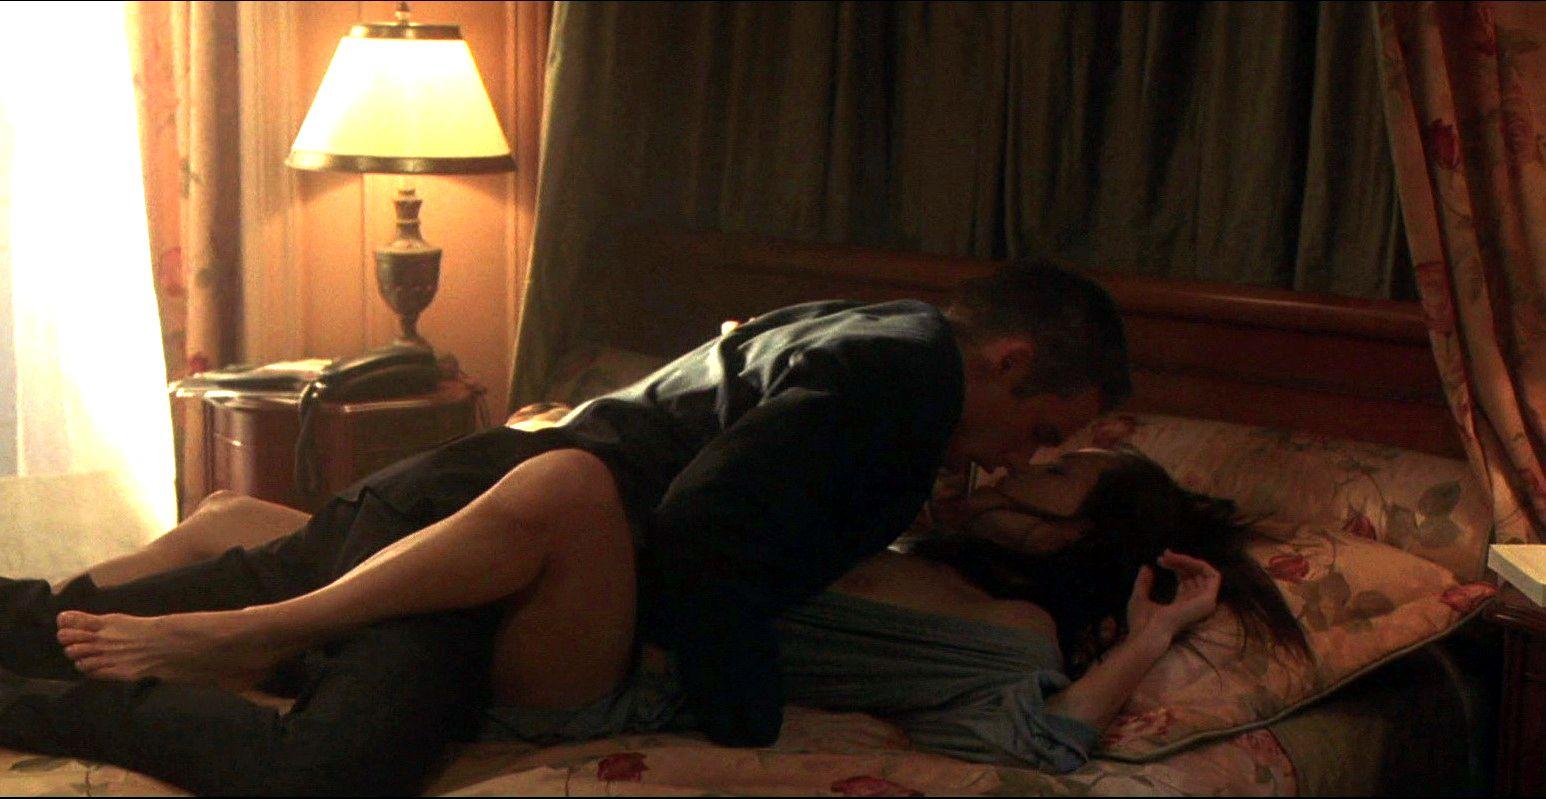 Angelina Jolie Naked Taking Lives angelina jolie's nude scenes - alrincon